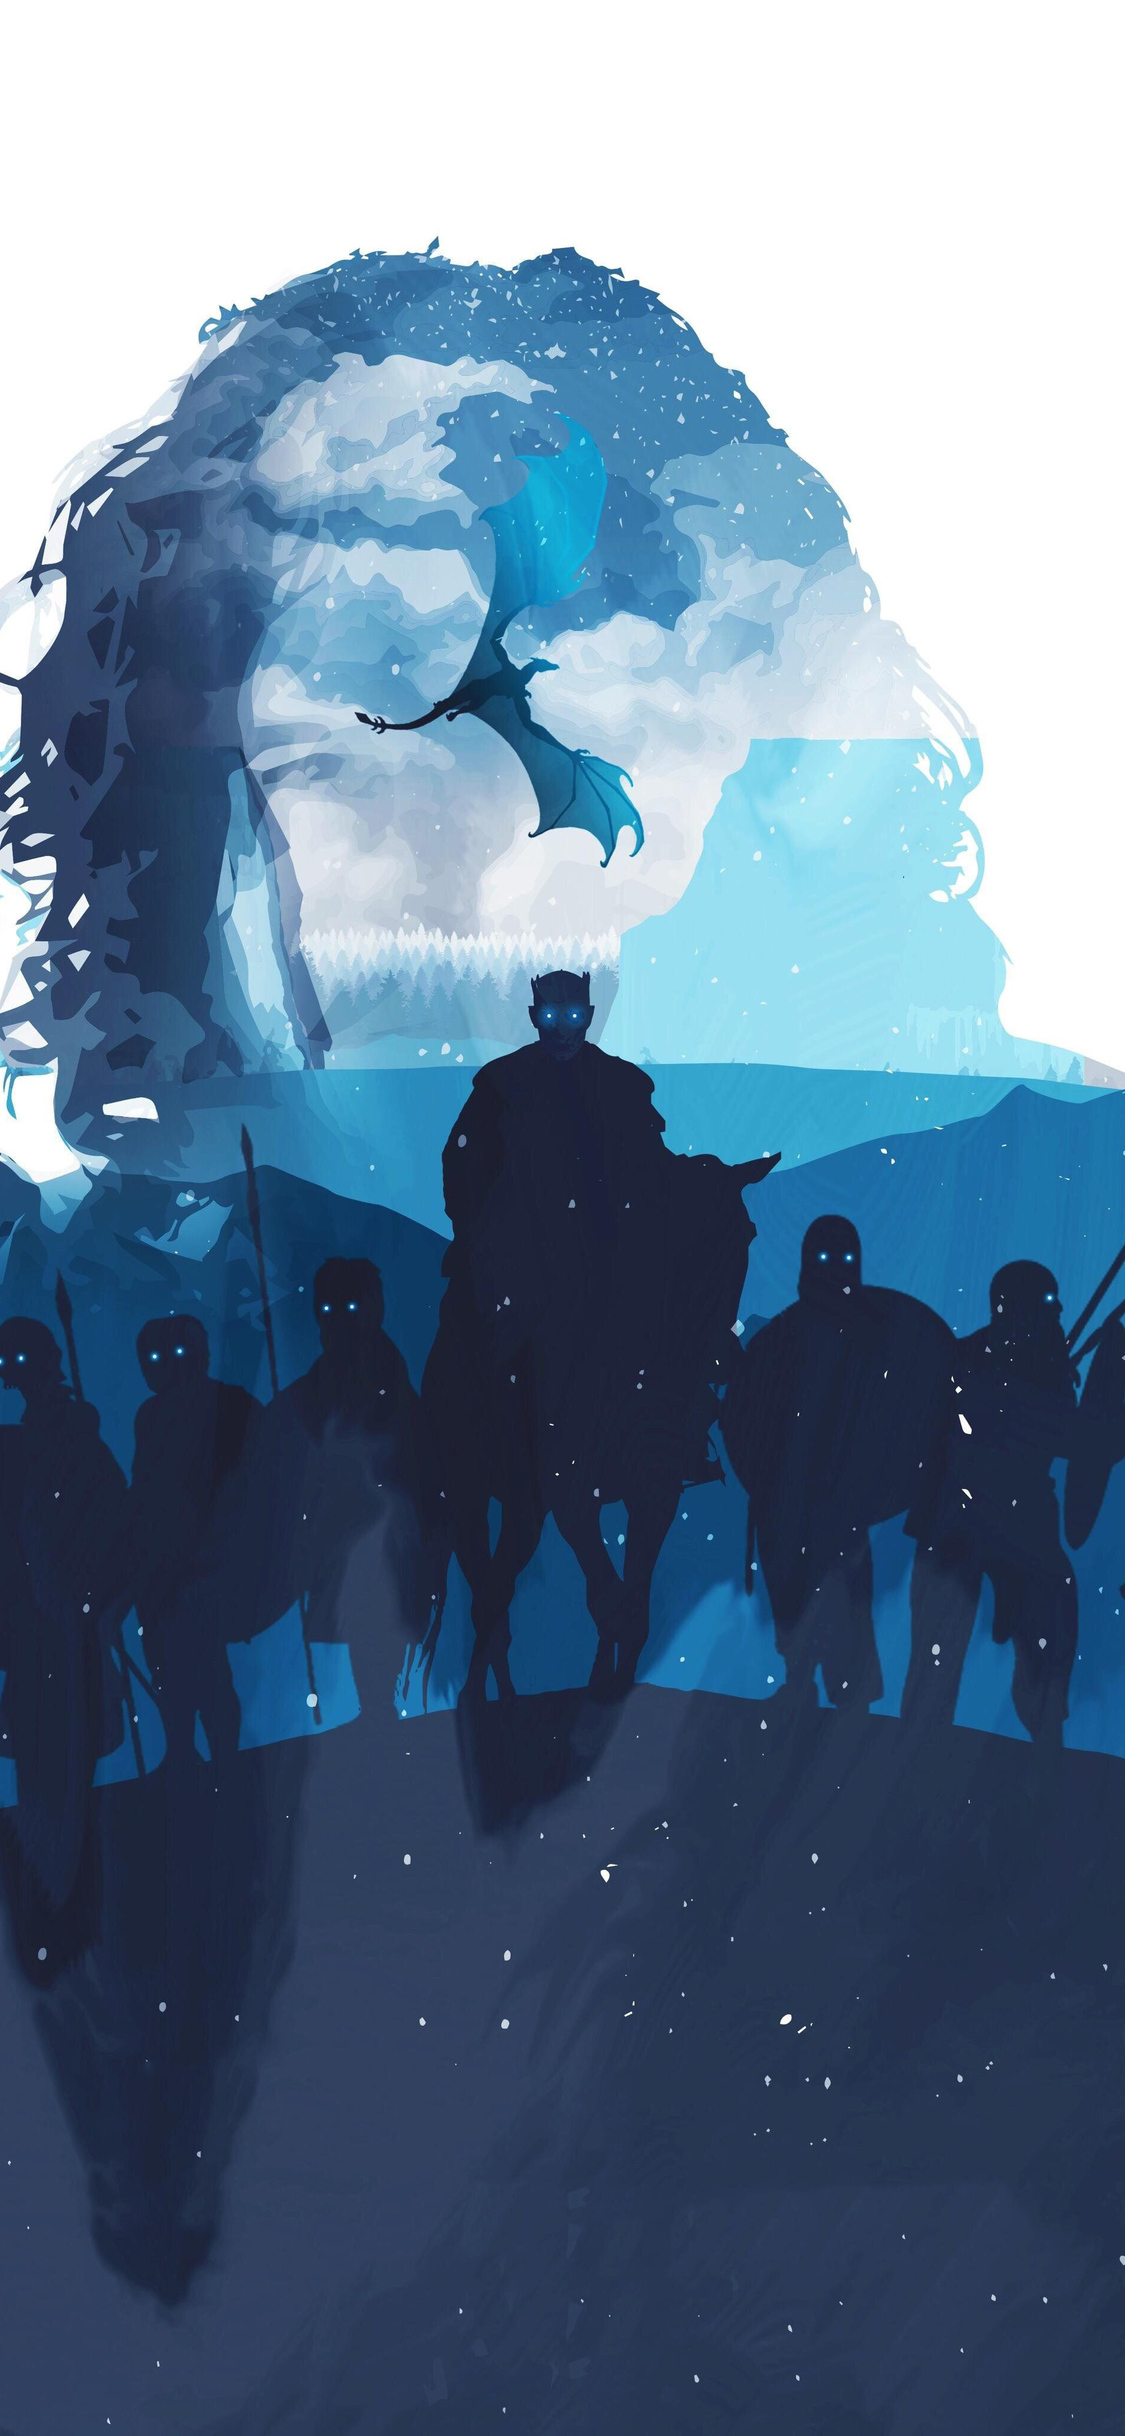 Game Of Thrones Wallpaper Game Of Thrones Wallpapers - Game Of Thrones Wallpapers Iphone - HD Wallpaper